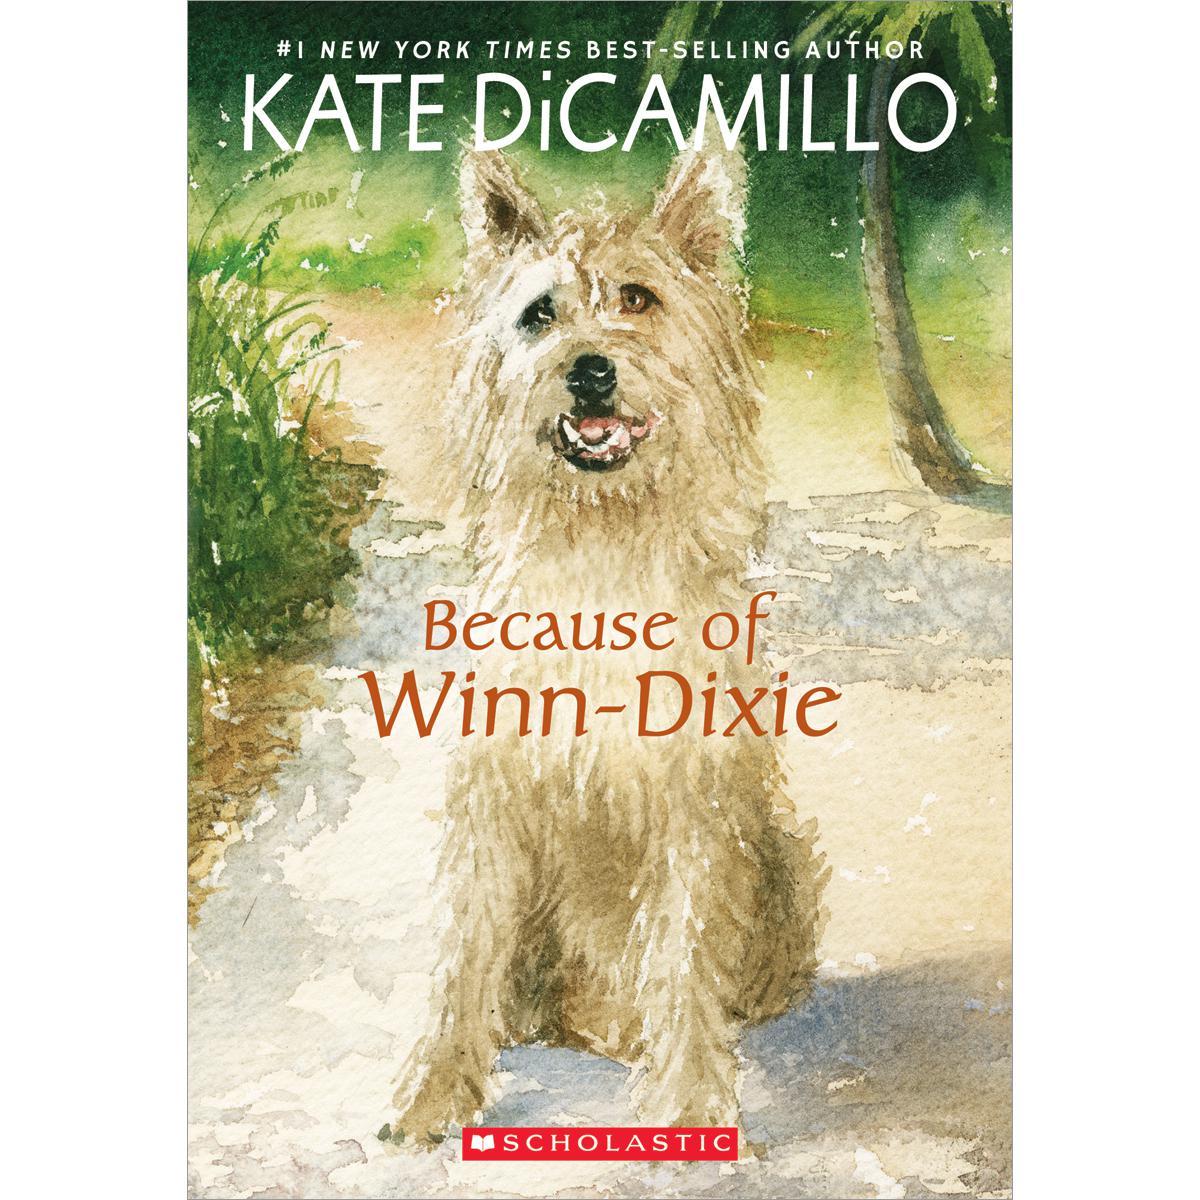 Because of Winn-Dixie 6-Pack